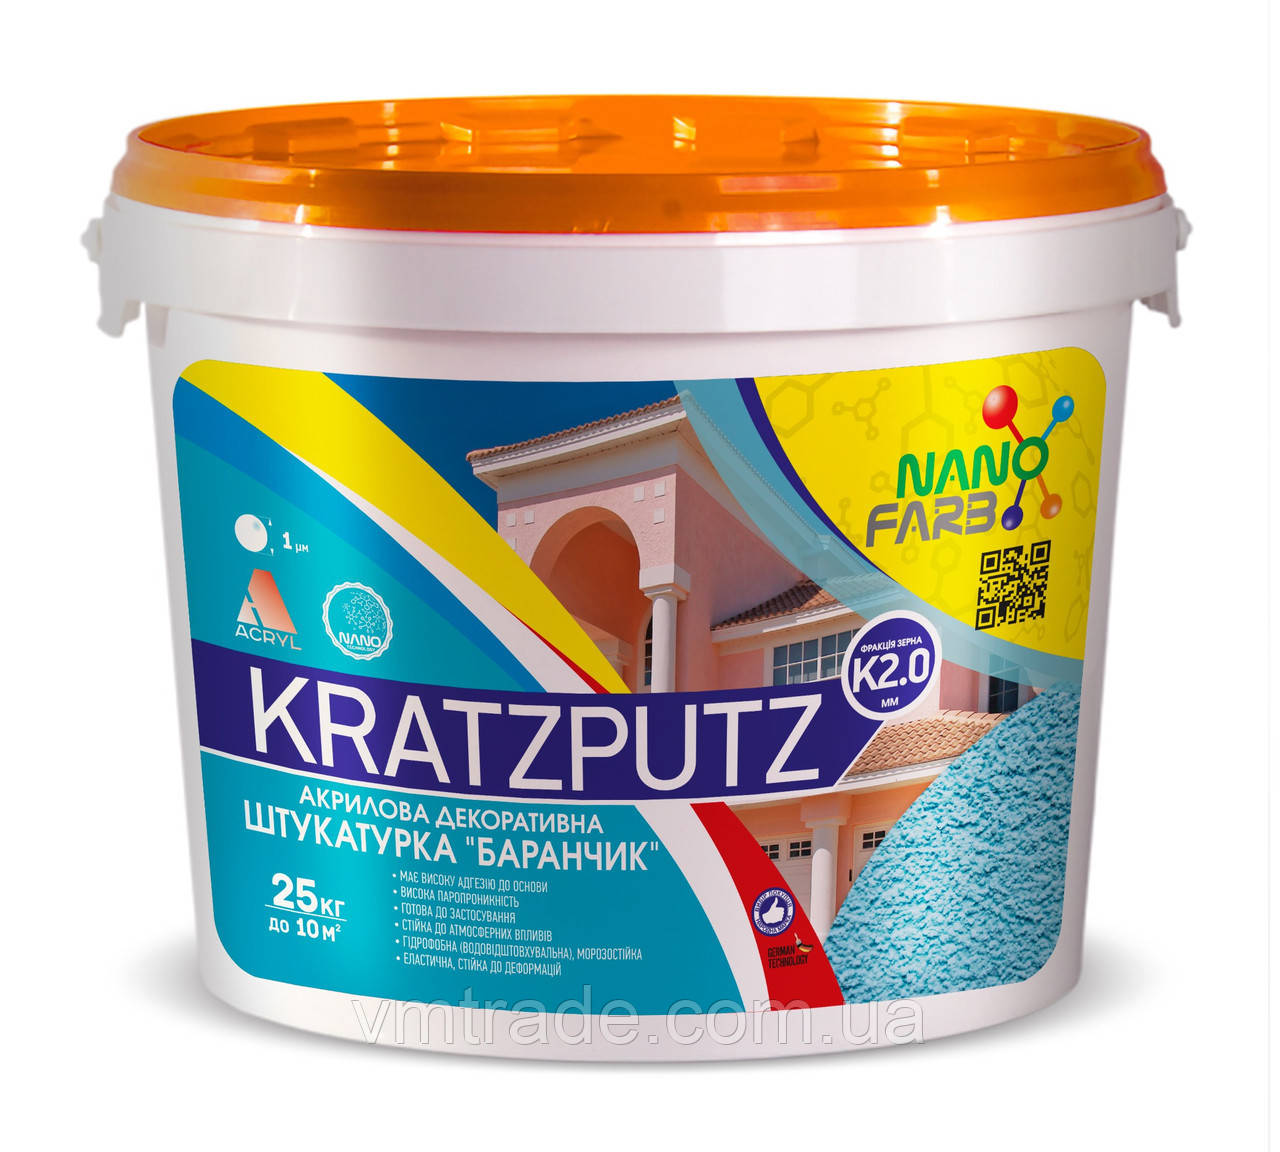 "Штукатурка акриловая декоративная Kratzputz ""барашек"" K 2.0 НаноФарб (NanoFarb) 25 кг"